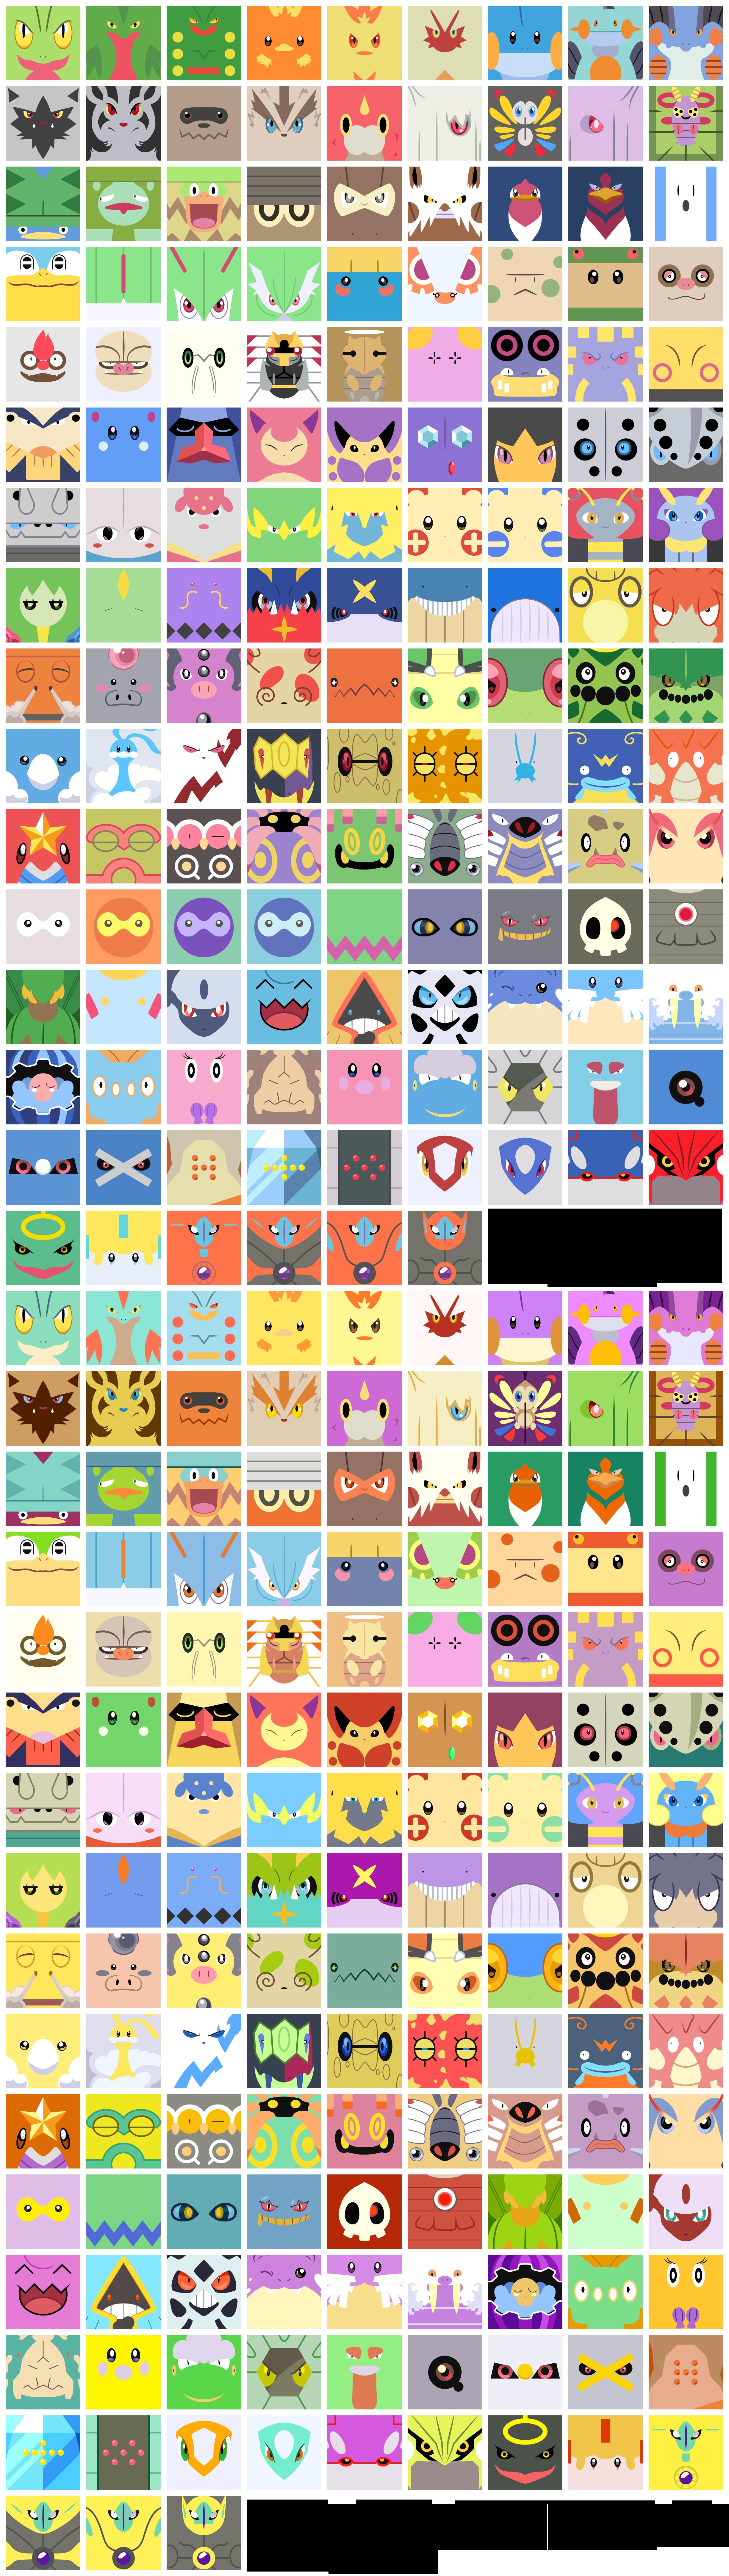 Free Avatars: All Hoenn Pokemon by The-Blue-Pangolin on DeviantArt